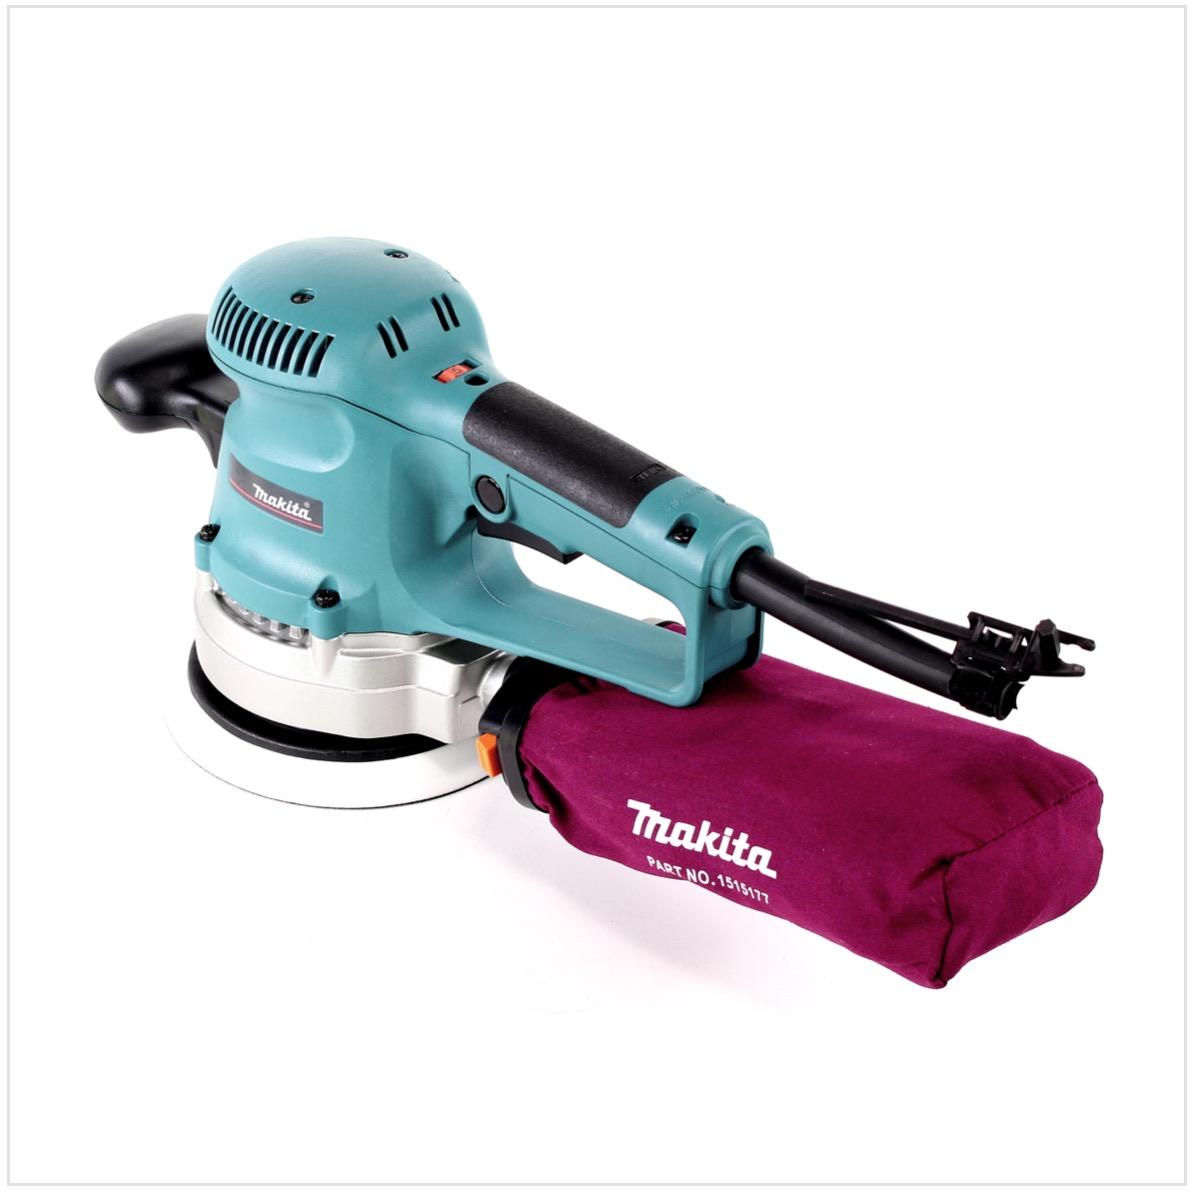 makita bo 6030 ponceuse excentrique Ø 150 mm avec 310 watt - sans